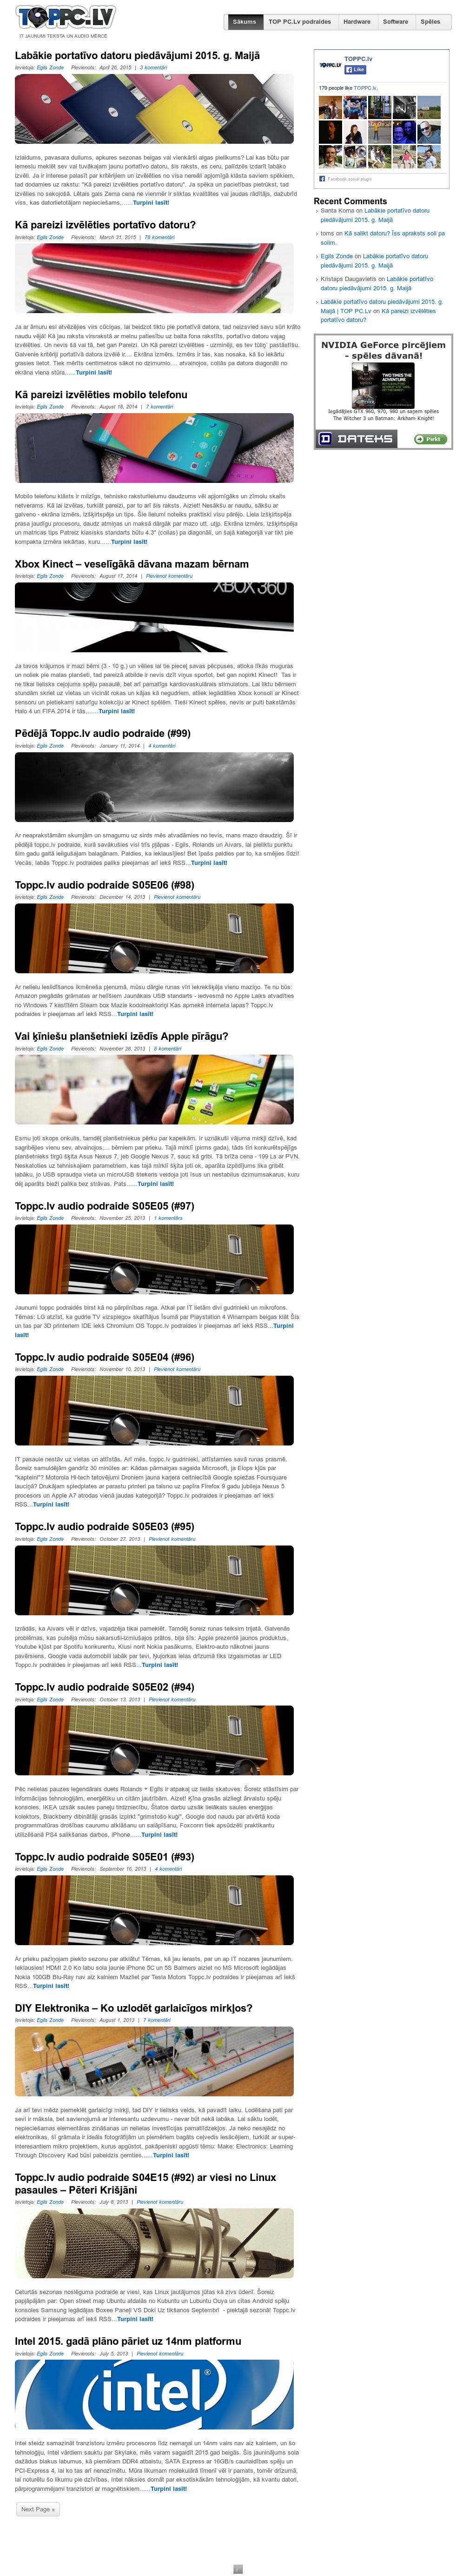 Toppc lv Competitors, Revenue and Employees - Owler Company Profile